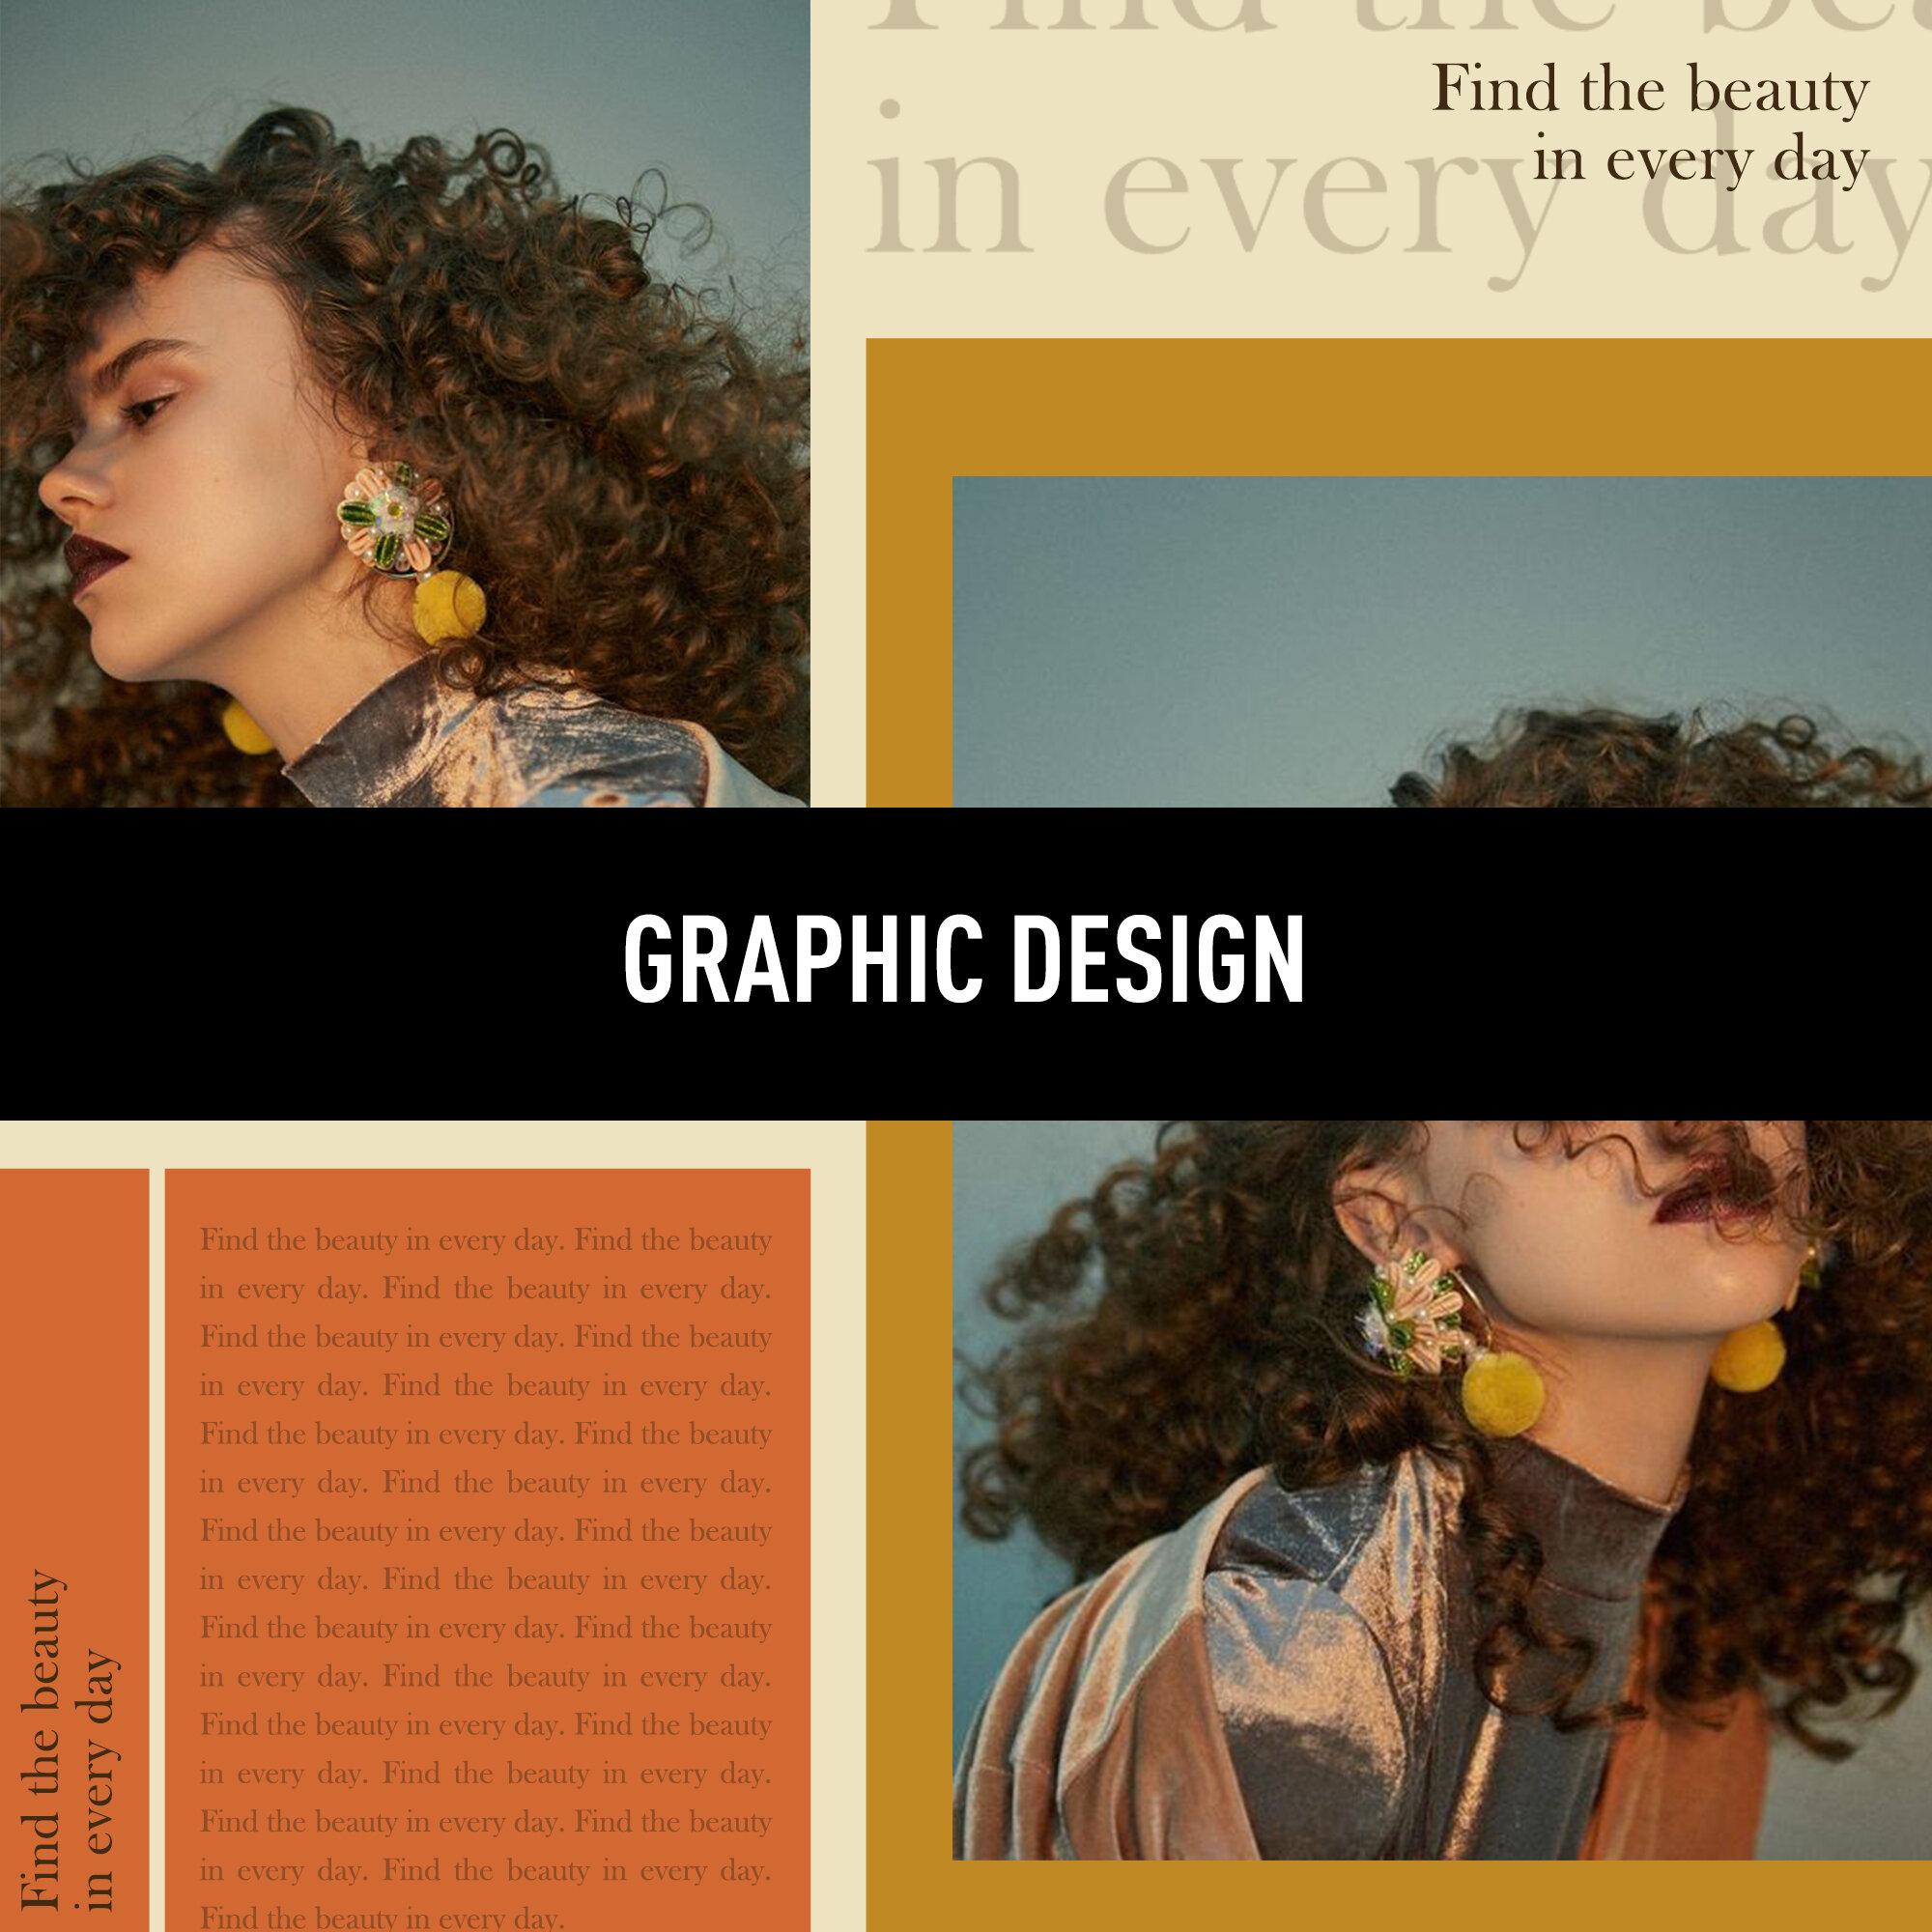 Services _ Graphic Design.jpg